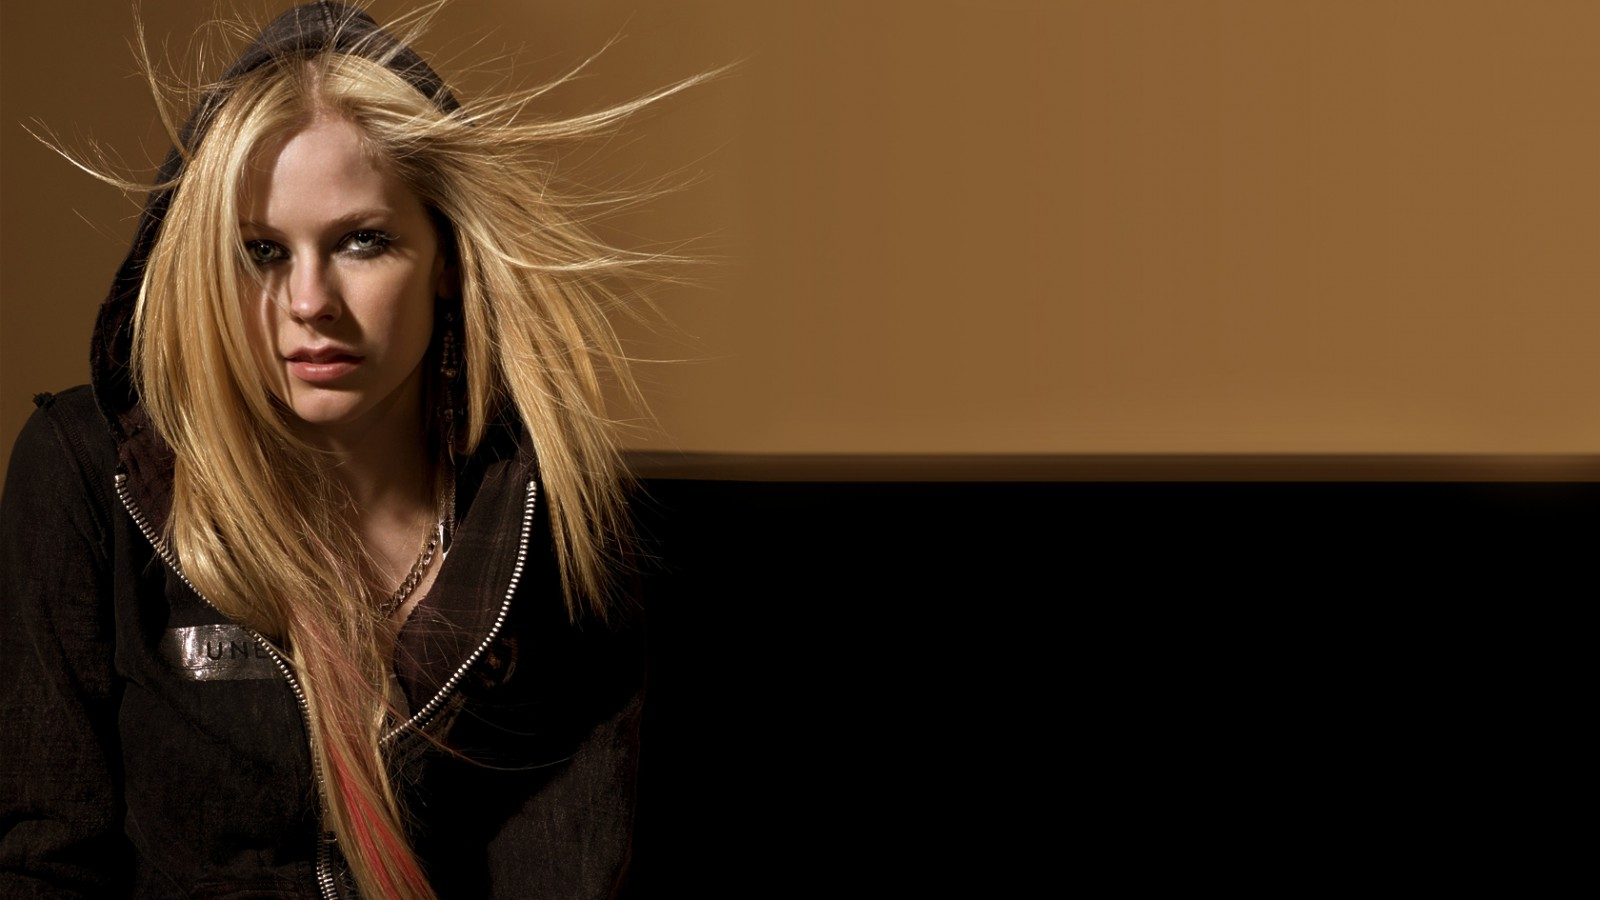 Avril-Lavigne-Wallpaper